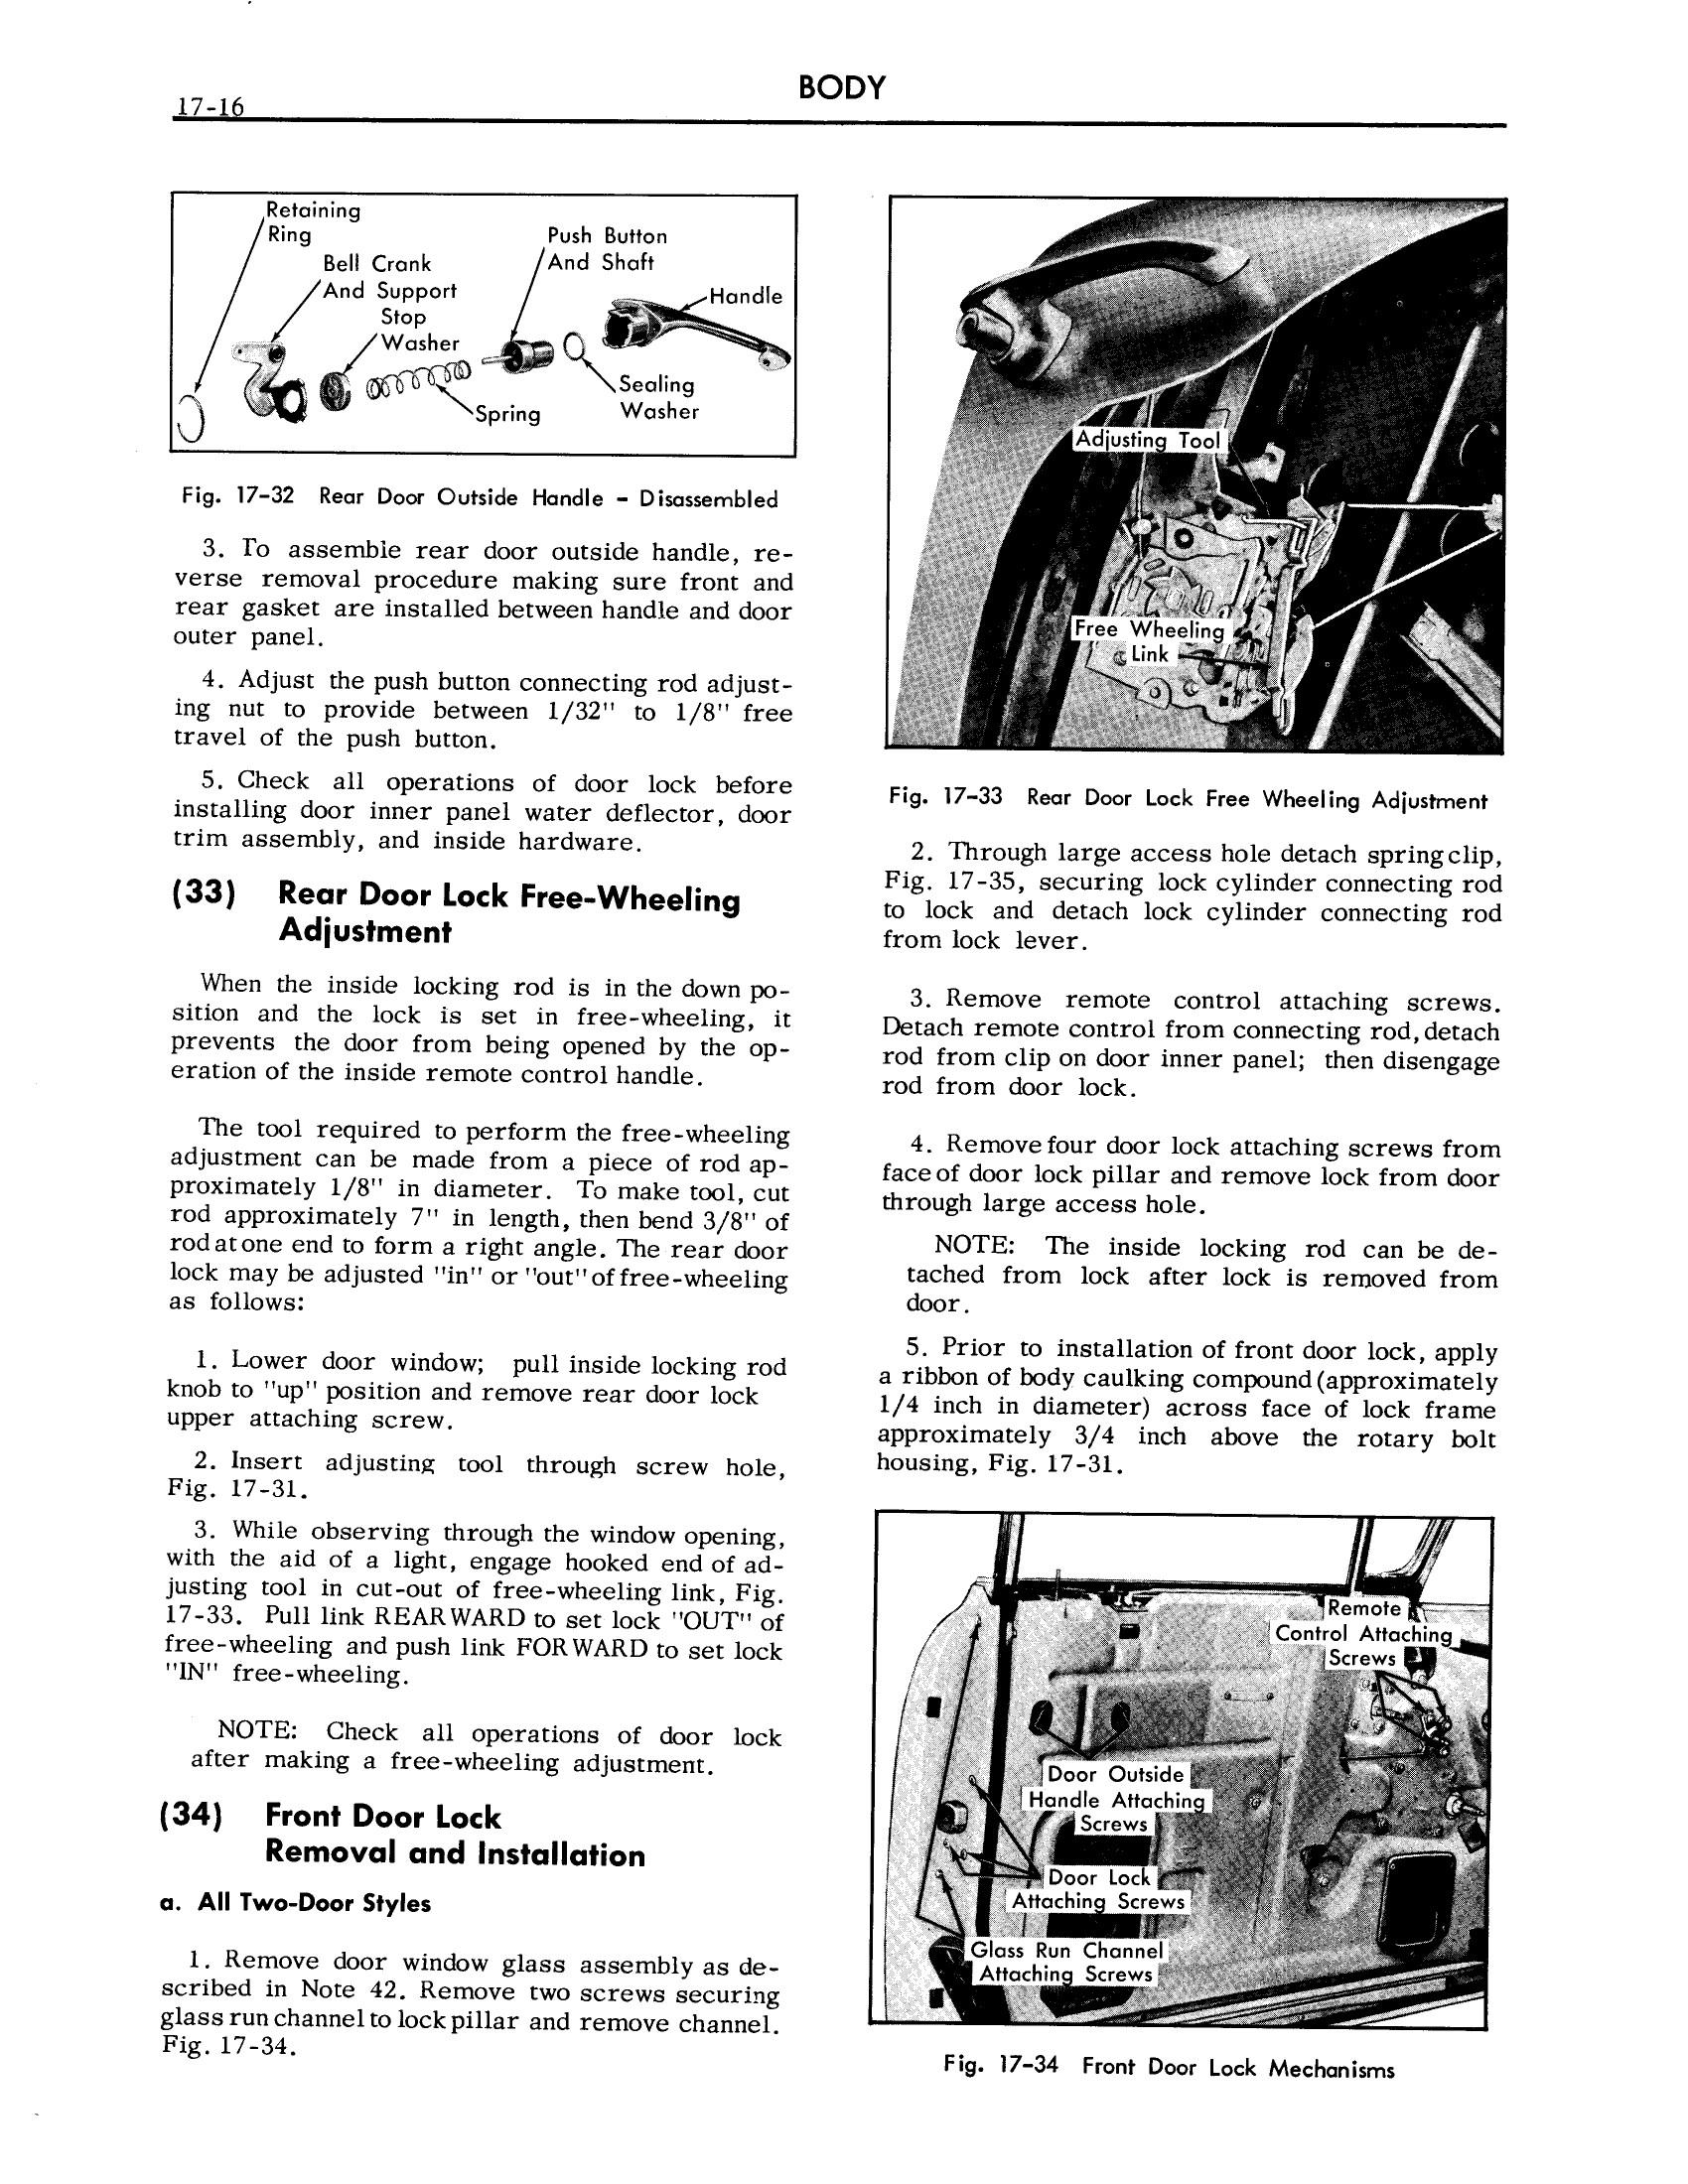 1957 Cadillac Shop Manual- Body Page 16 of 76